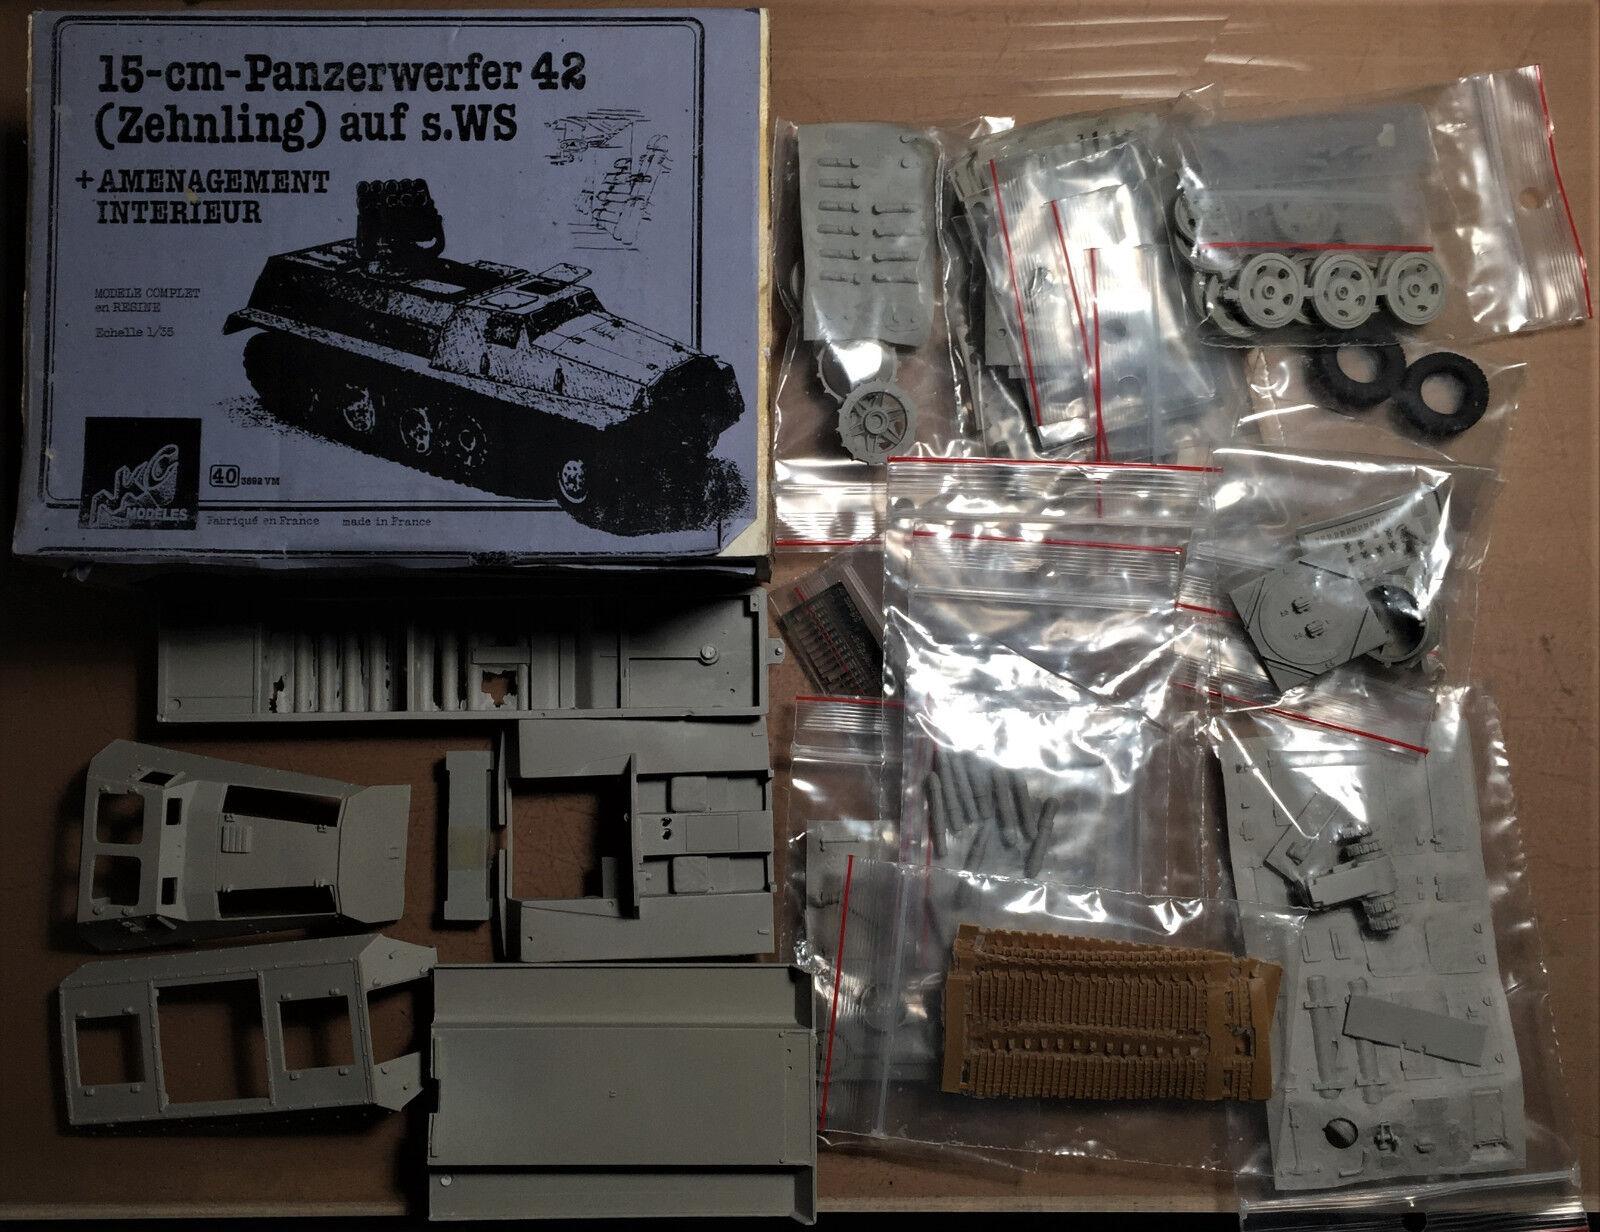 NKC MODELES 403592VM - 15cm PANZERWERFER 42 (ZEHNLING) AUF s.WS 1 35 RESIN KIT